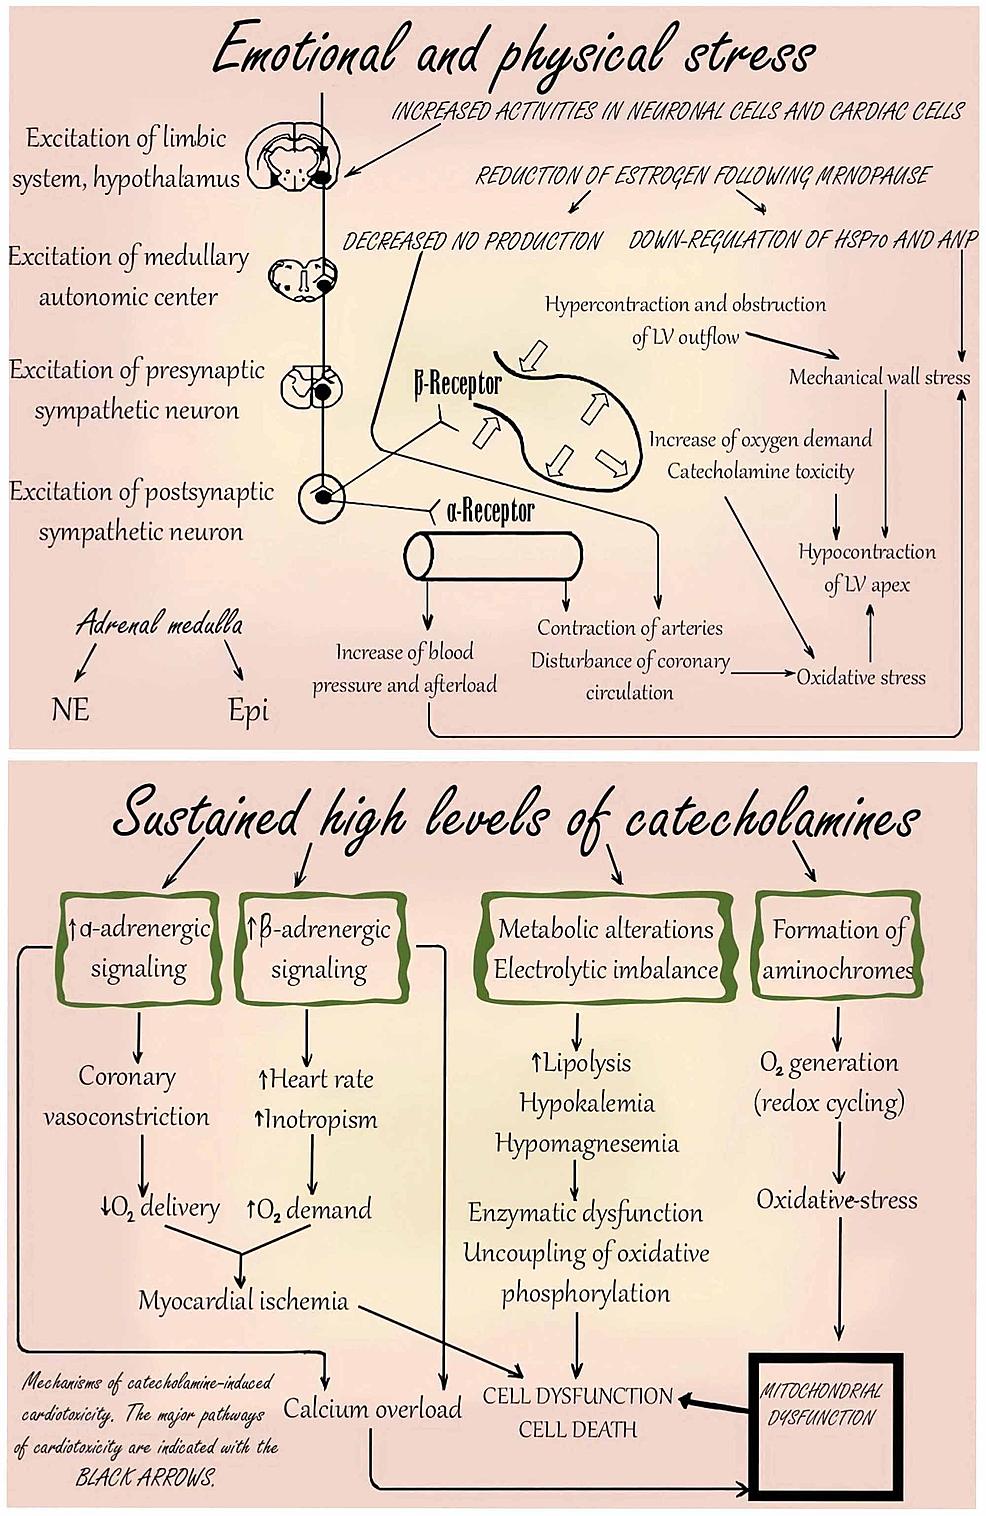 Pathogenesis-of-Takotsubo-cardiomyopathy-